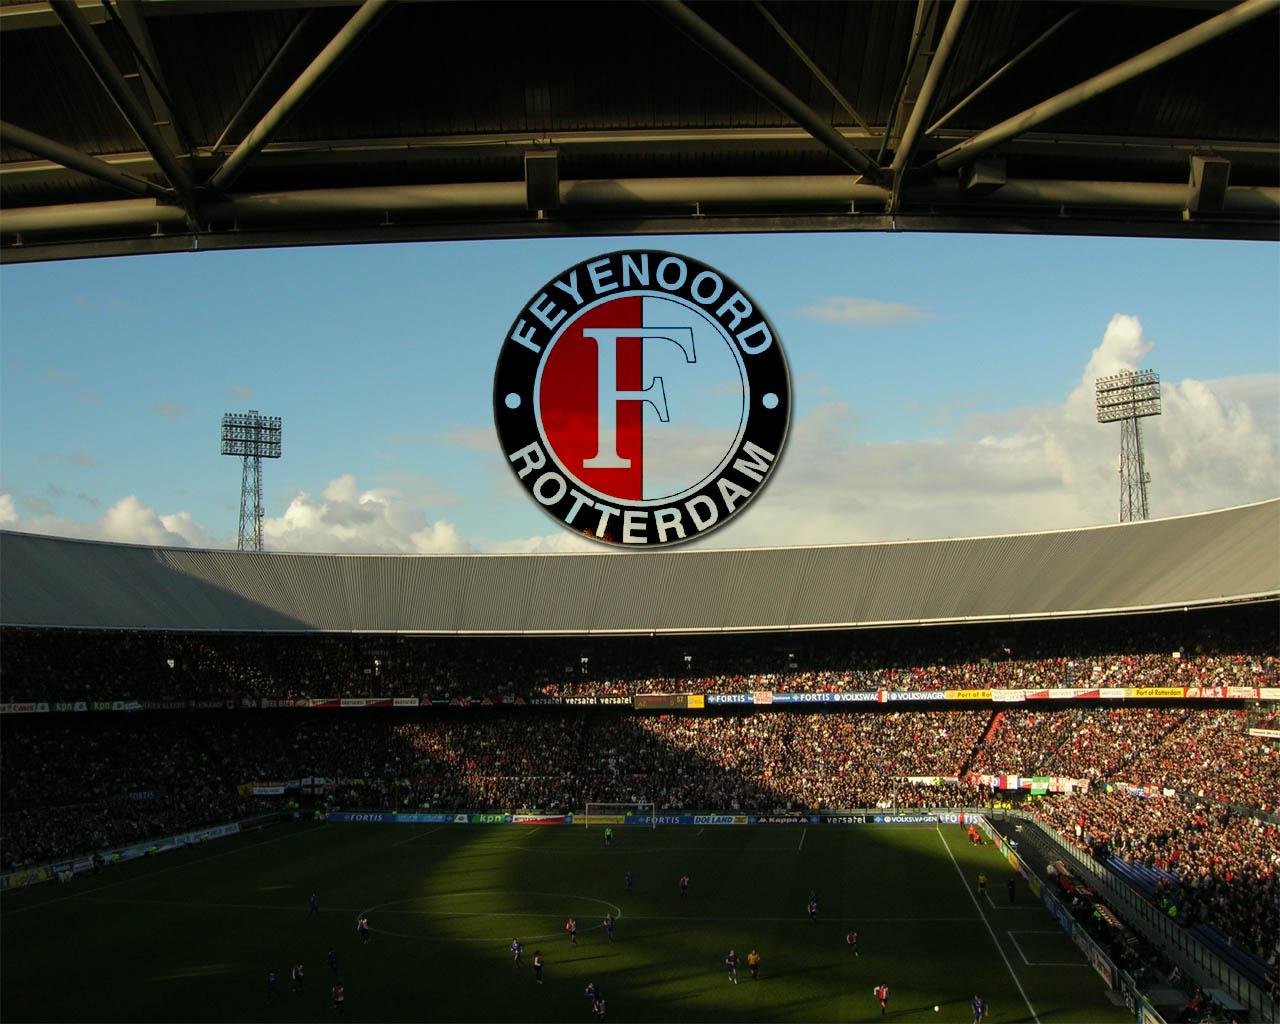 Windows 7 Wallpaper Hd 3d For Desktop Football Soccer Wallpapers 187 Feyenoord De Kuip Wallpapers